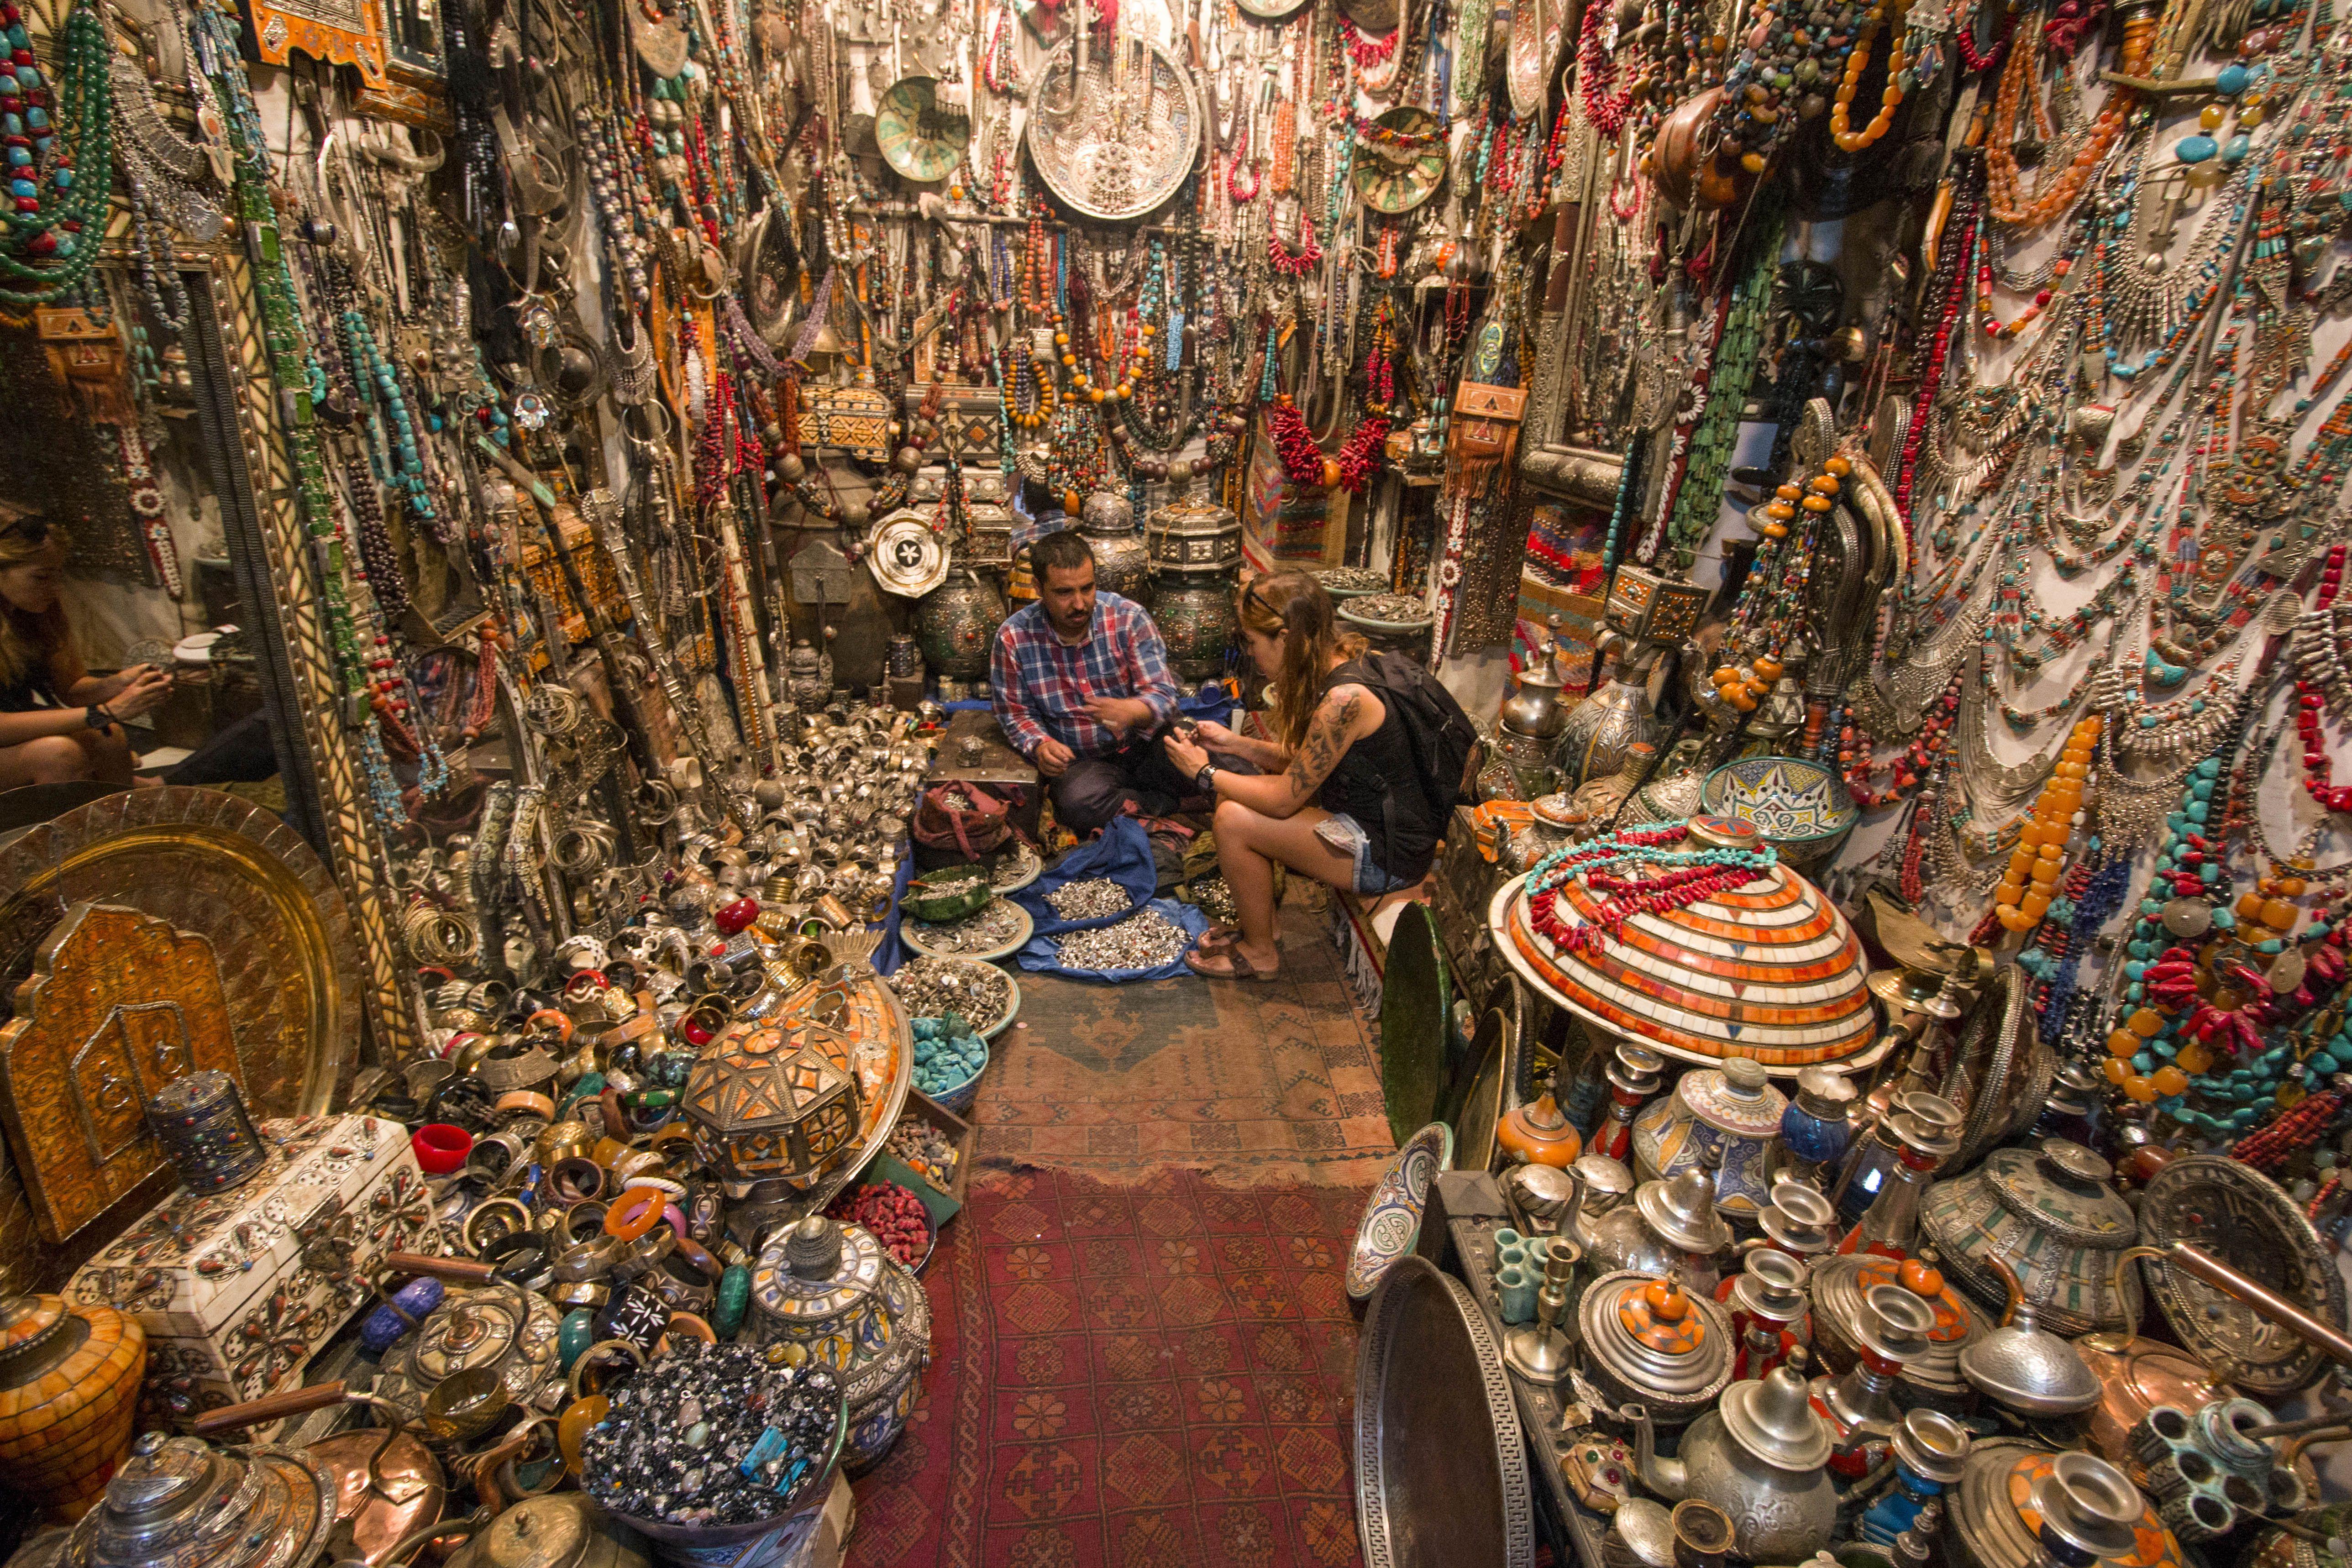 A woman shopping in the medina